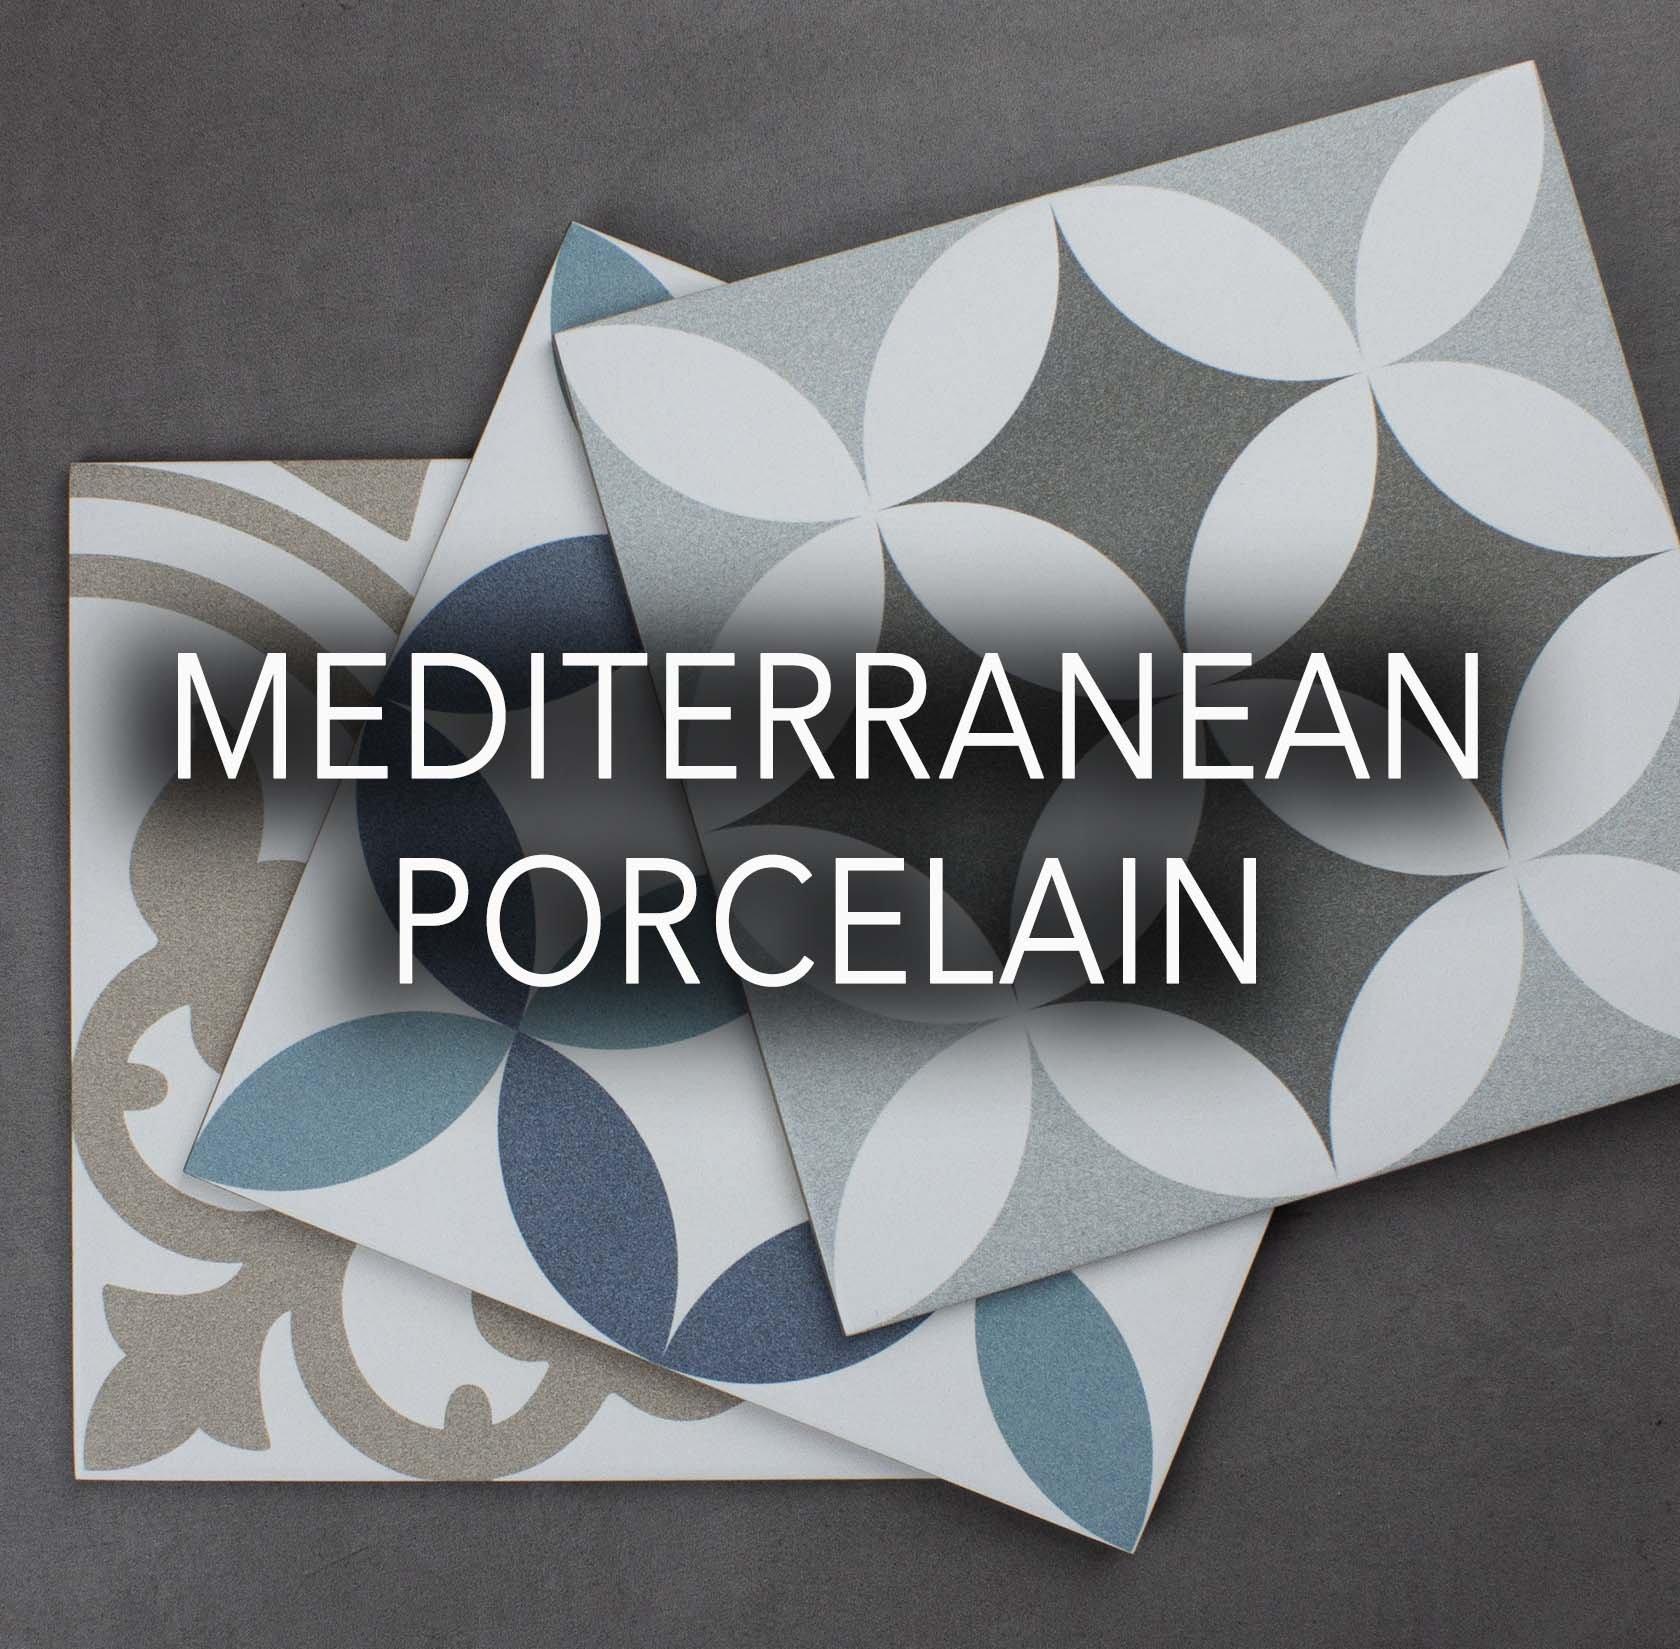 Mediterranean Porcelain tiles